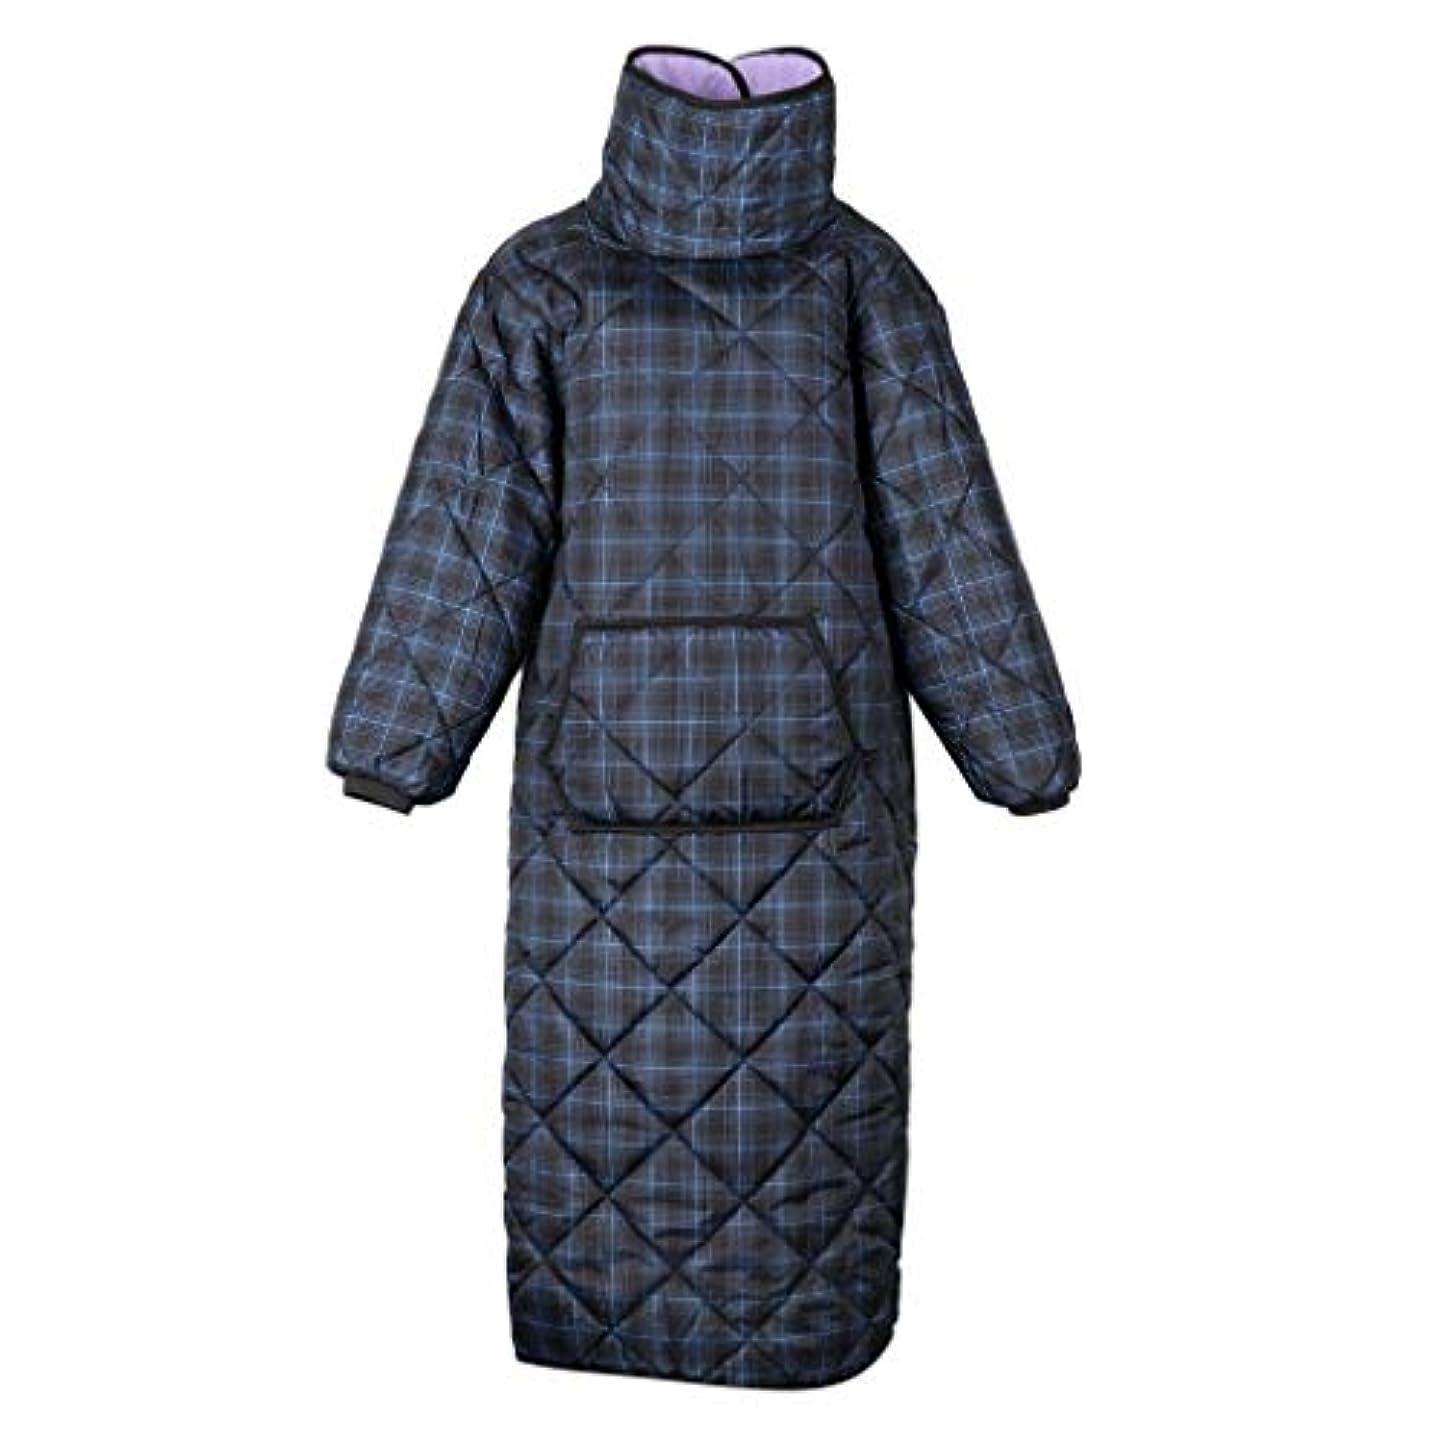 Toygogo 冬の風邪の保護衣類のコートのマットパッドのポケットが付いている熱キルトの羽毛布団